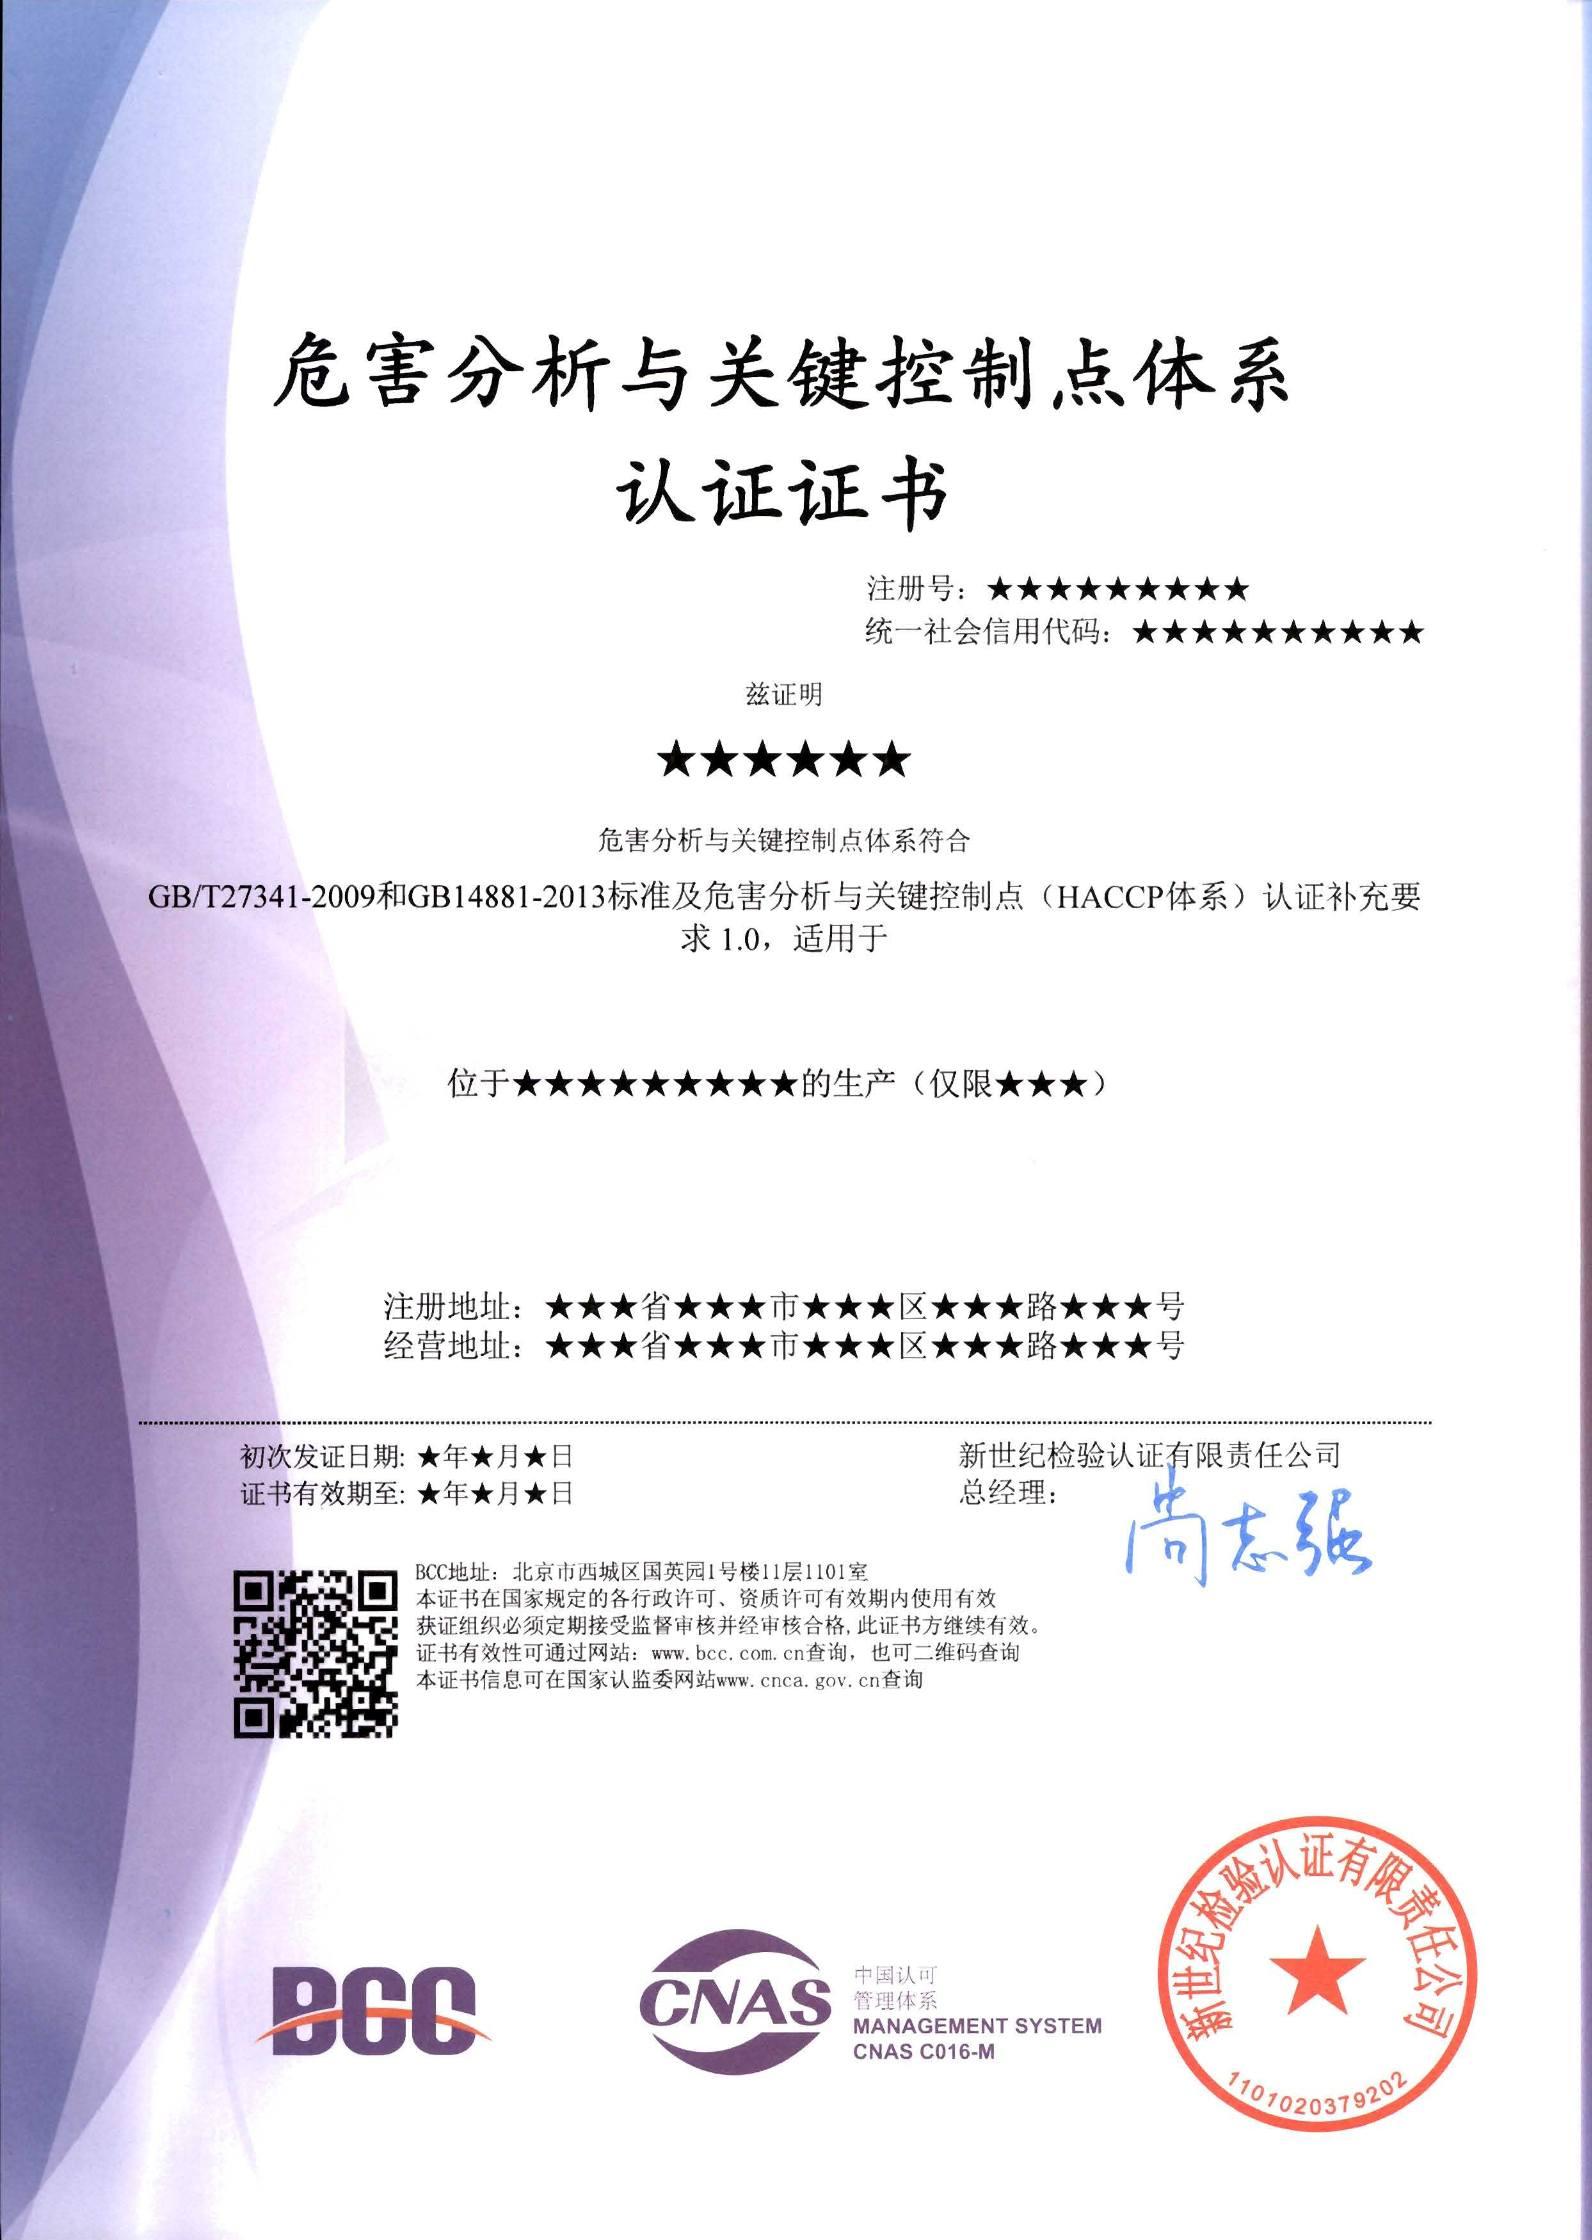 haccp认证费用_HACCP体系认证_流程 报价 案例 政策-新世纪认证家园